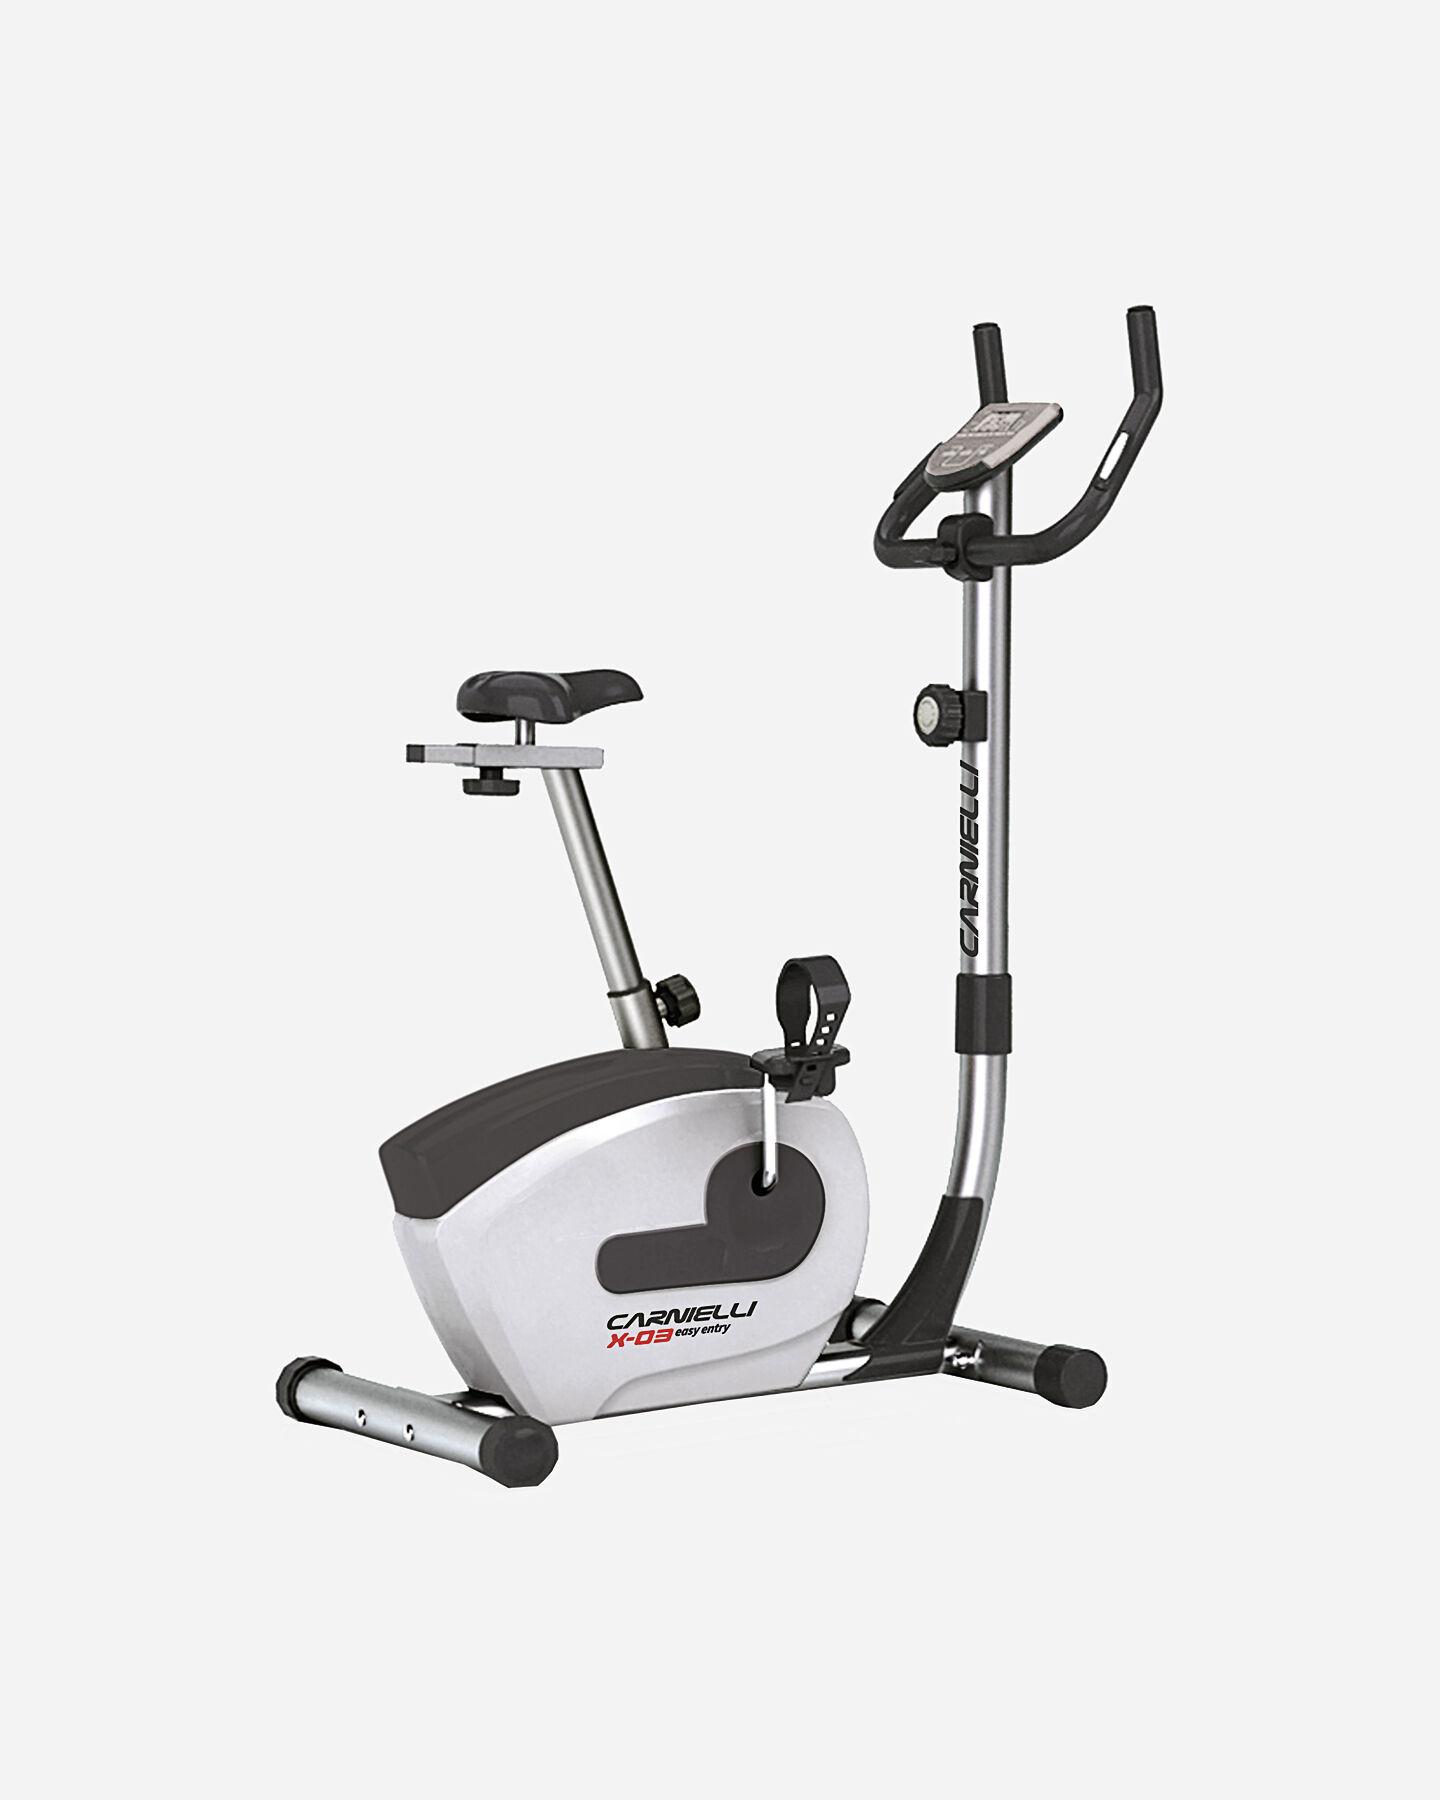 Cyclette CARNIELLI X-03 EASY ENTRY S1318722 1 UNI scatto 0